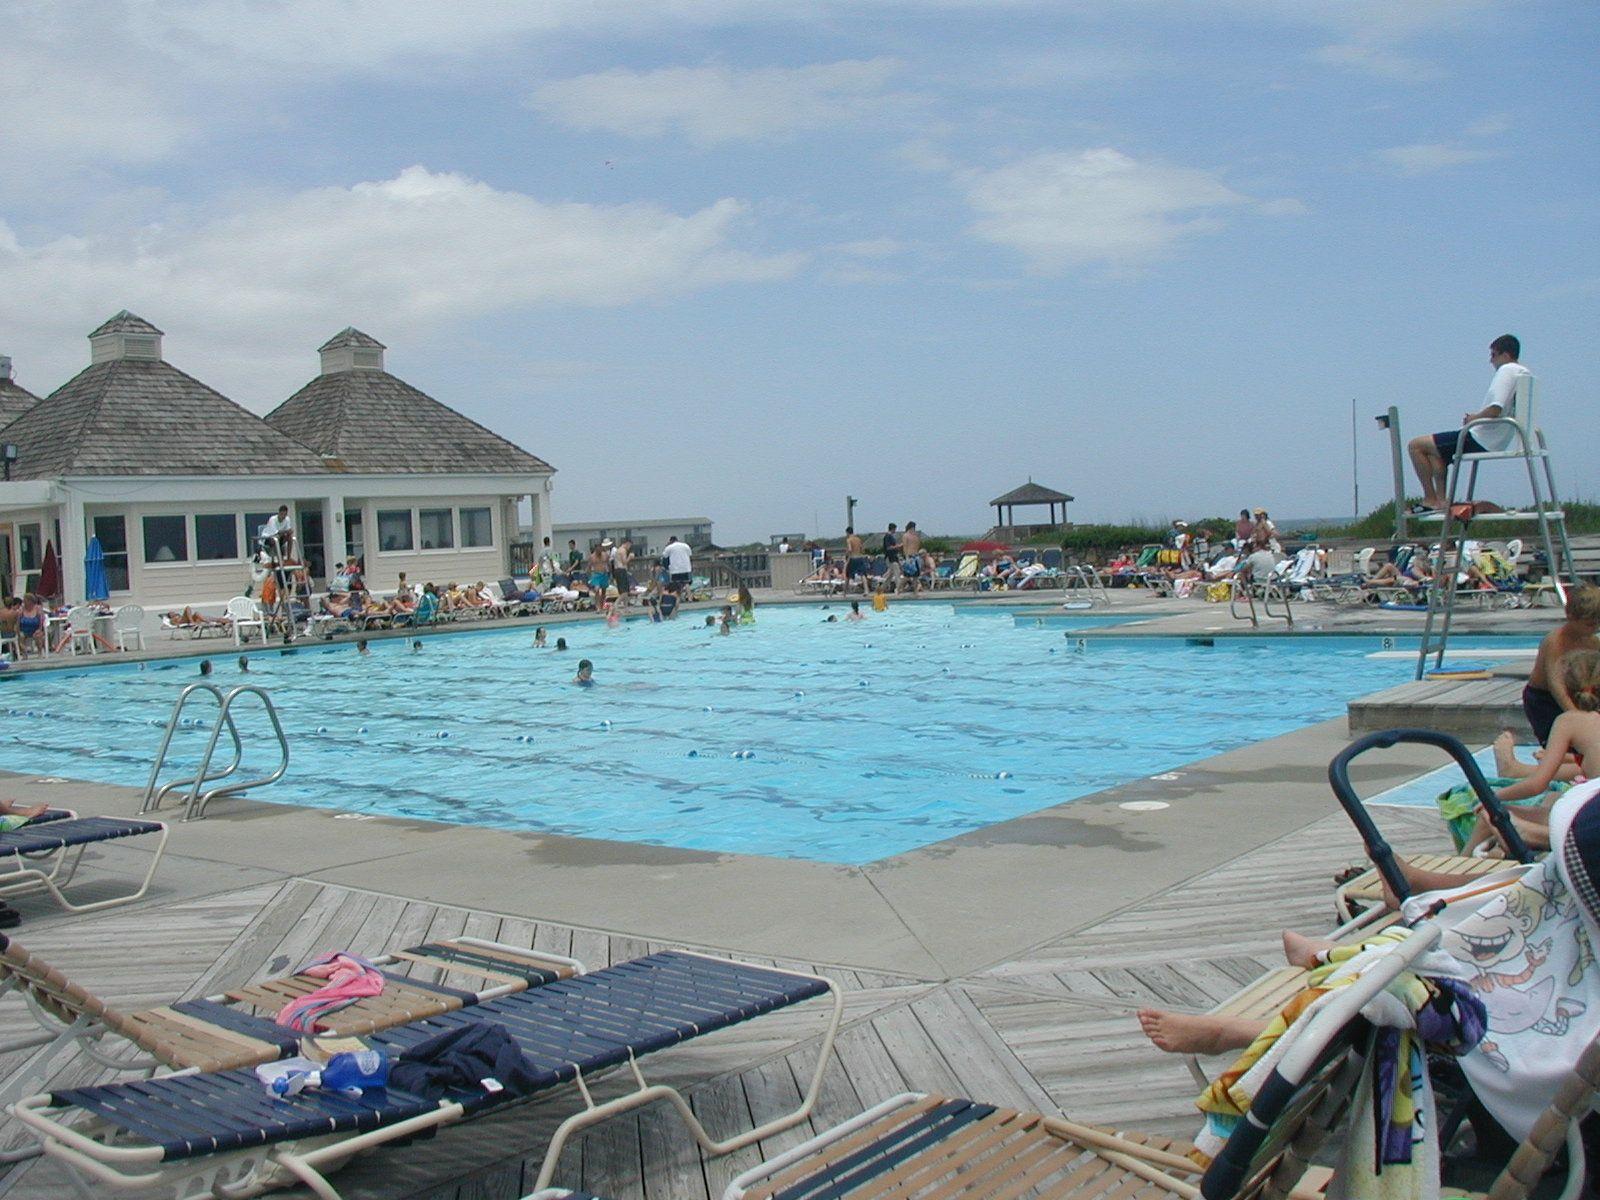 Village Beach Club Nags Head North Carolina